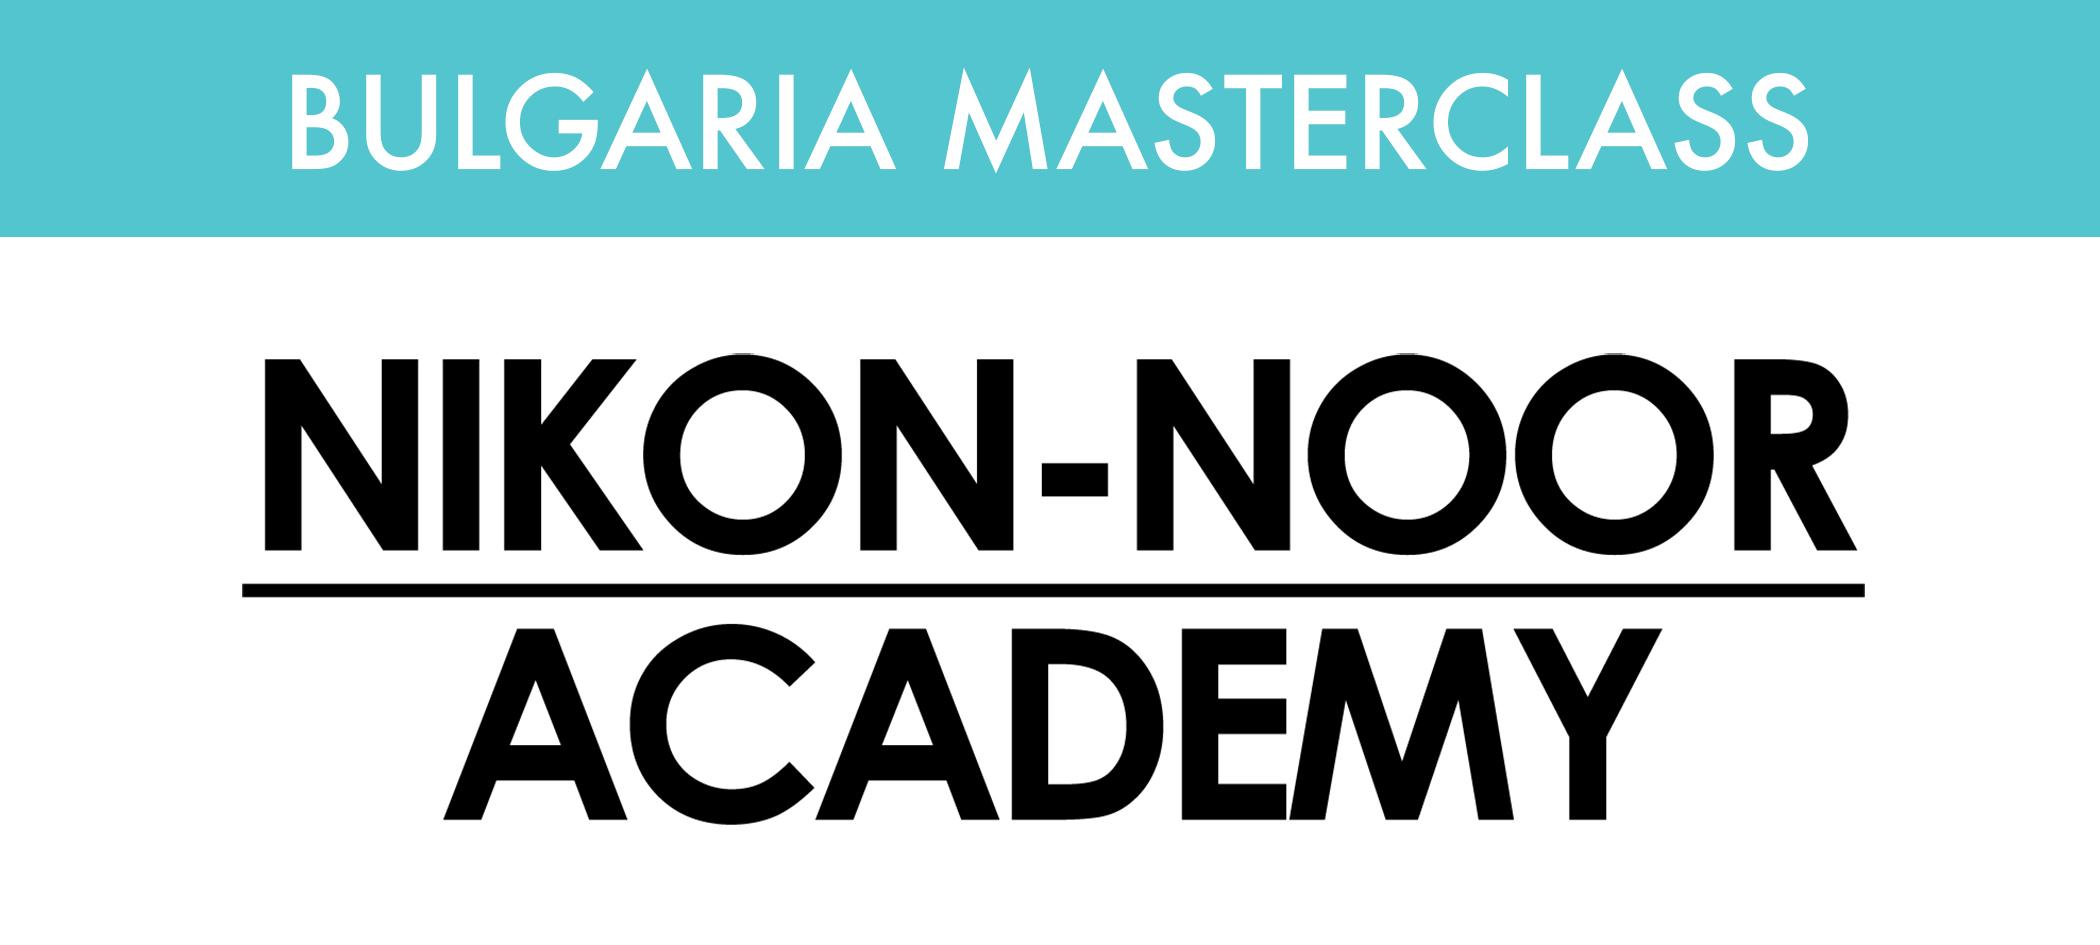 Nikon-NOOR Academy BULGARIA.jpg